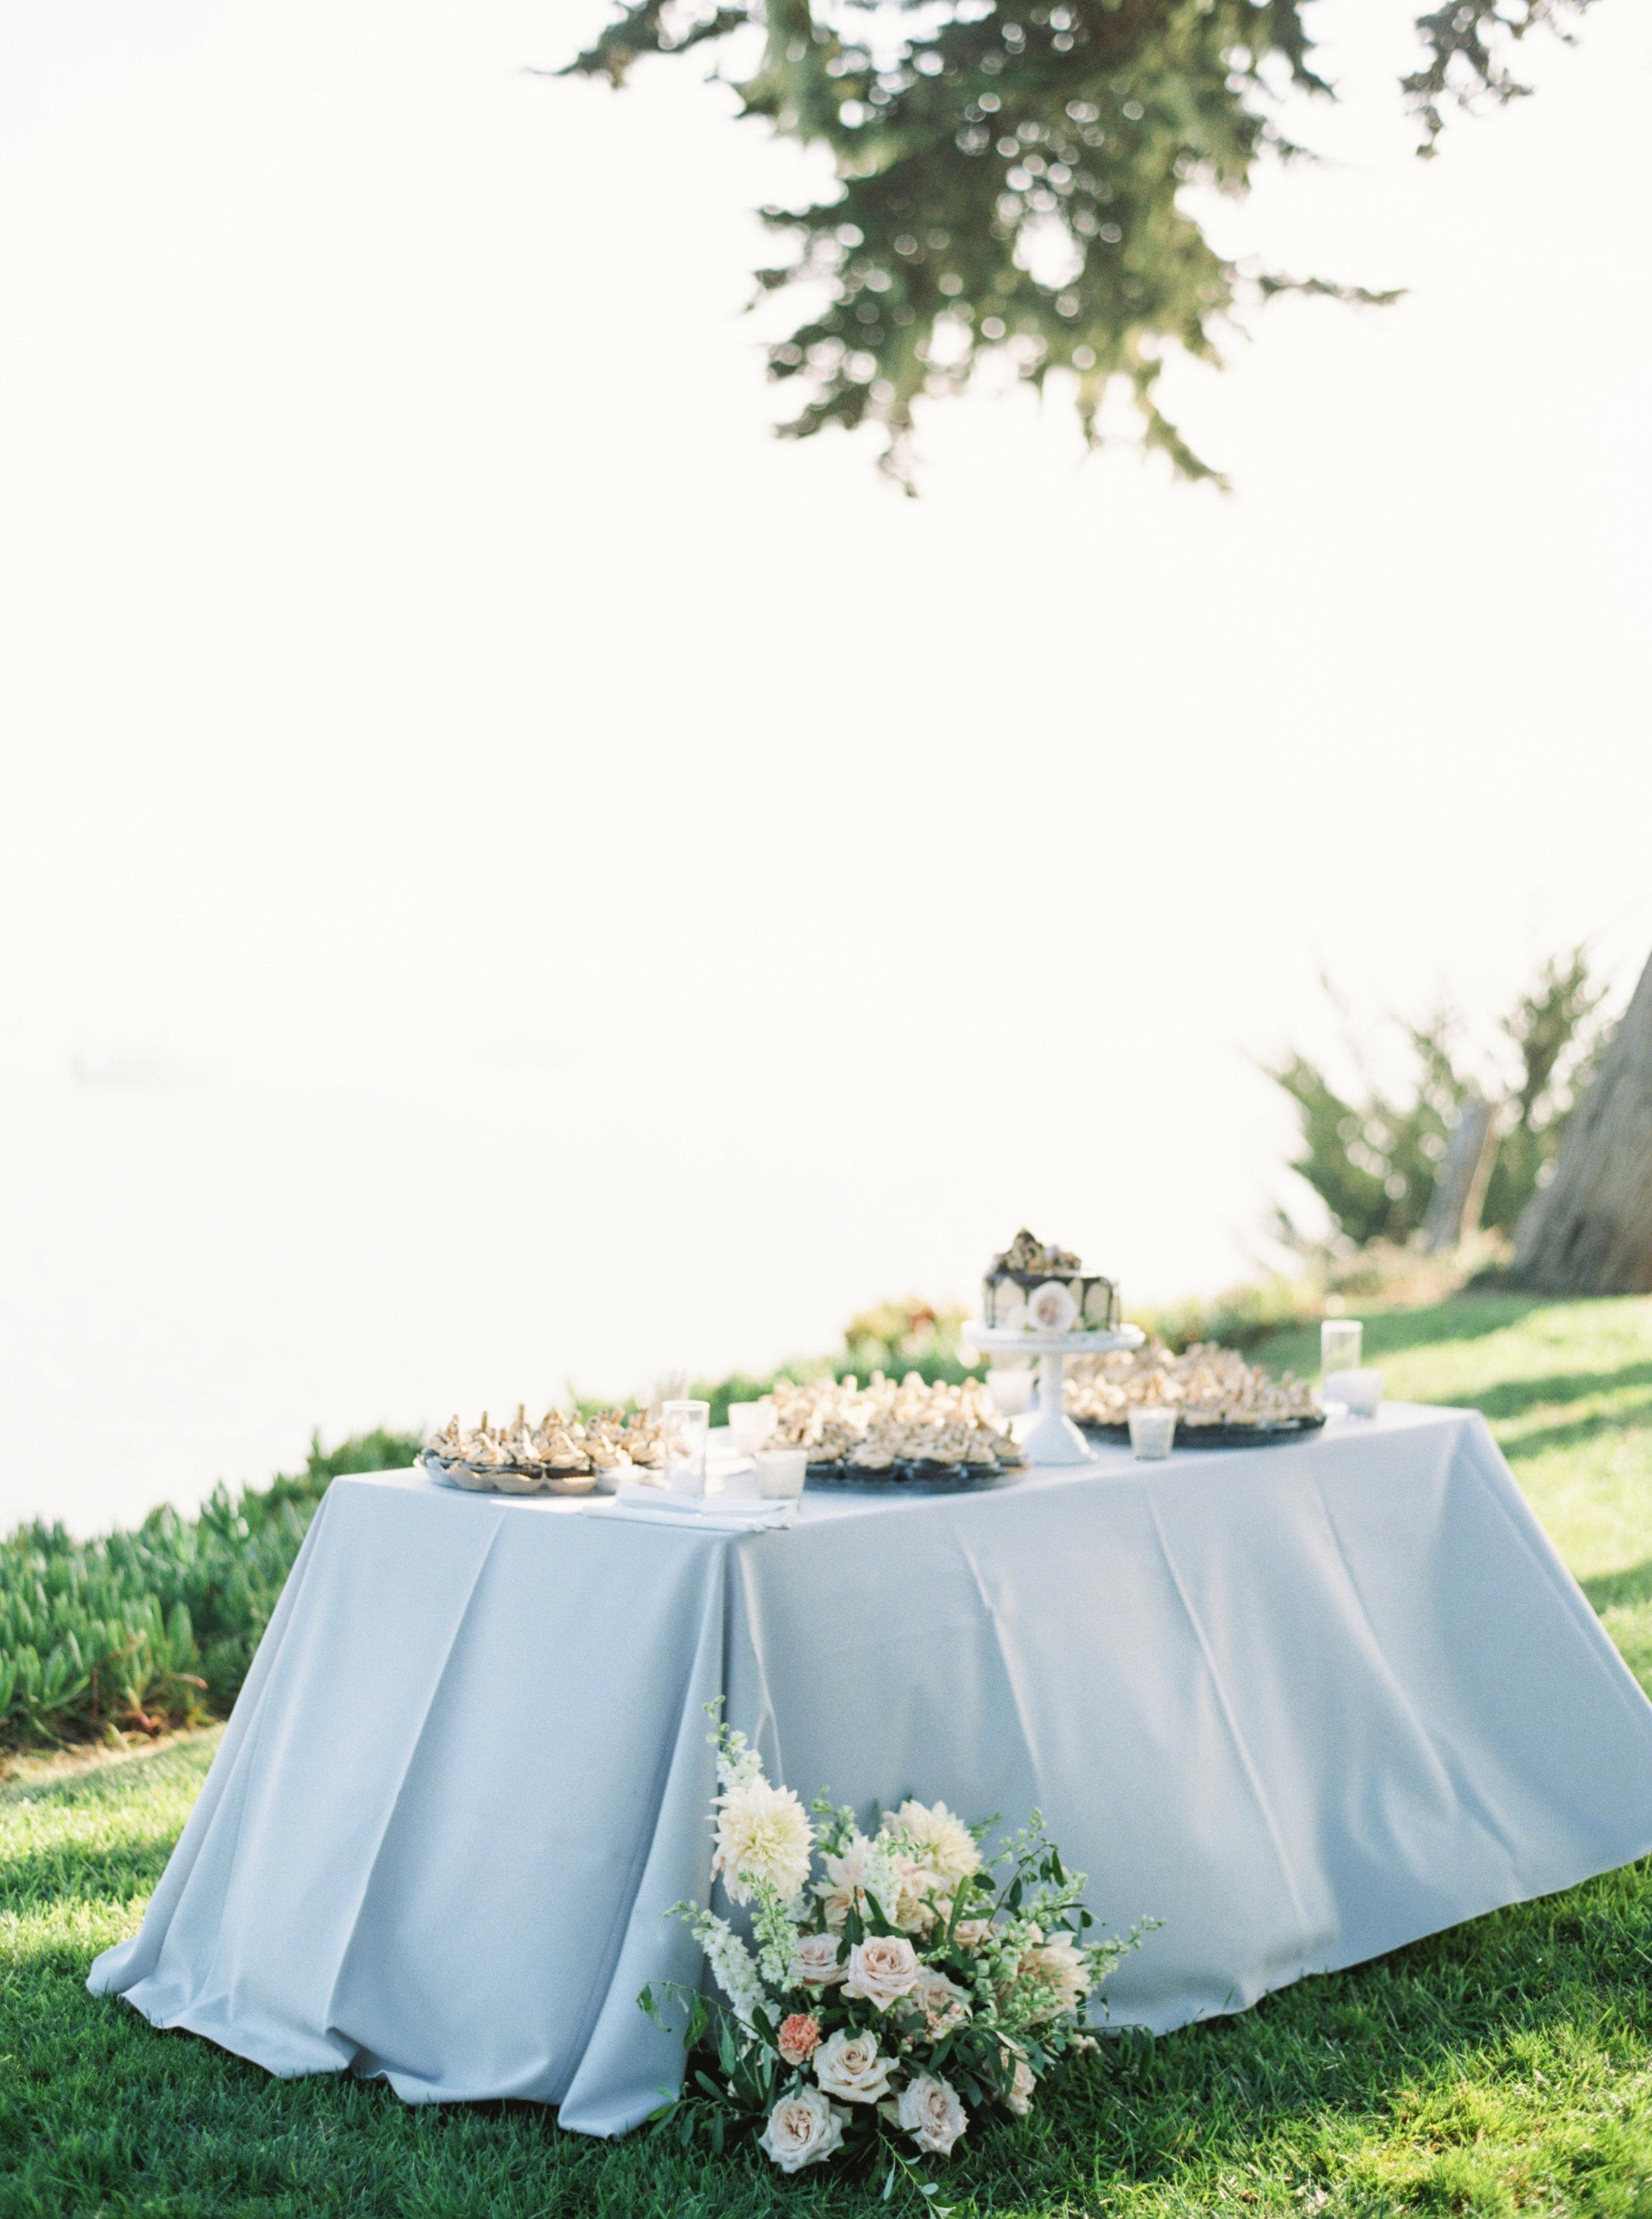 trynhphoto_socal_sf_halfmoon_bay_wedding_photographer_JA-587.jpg